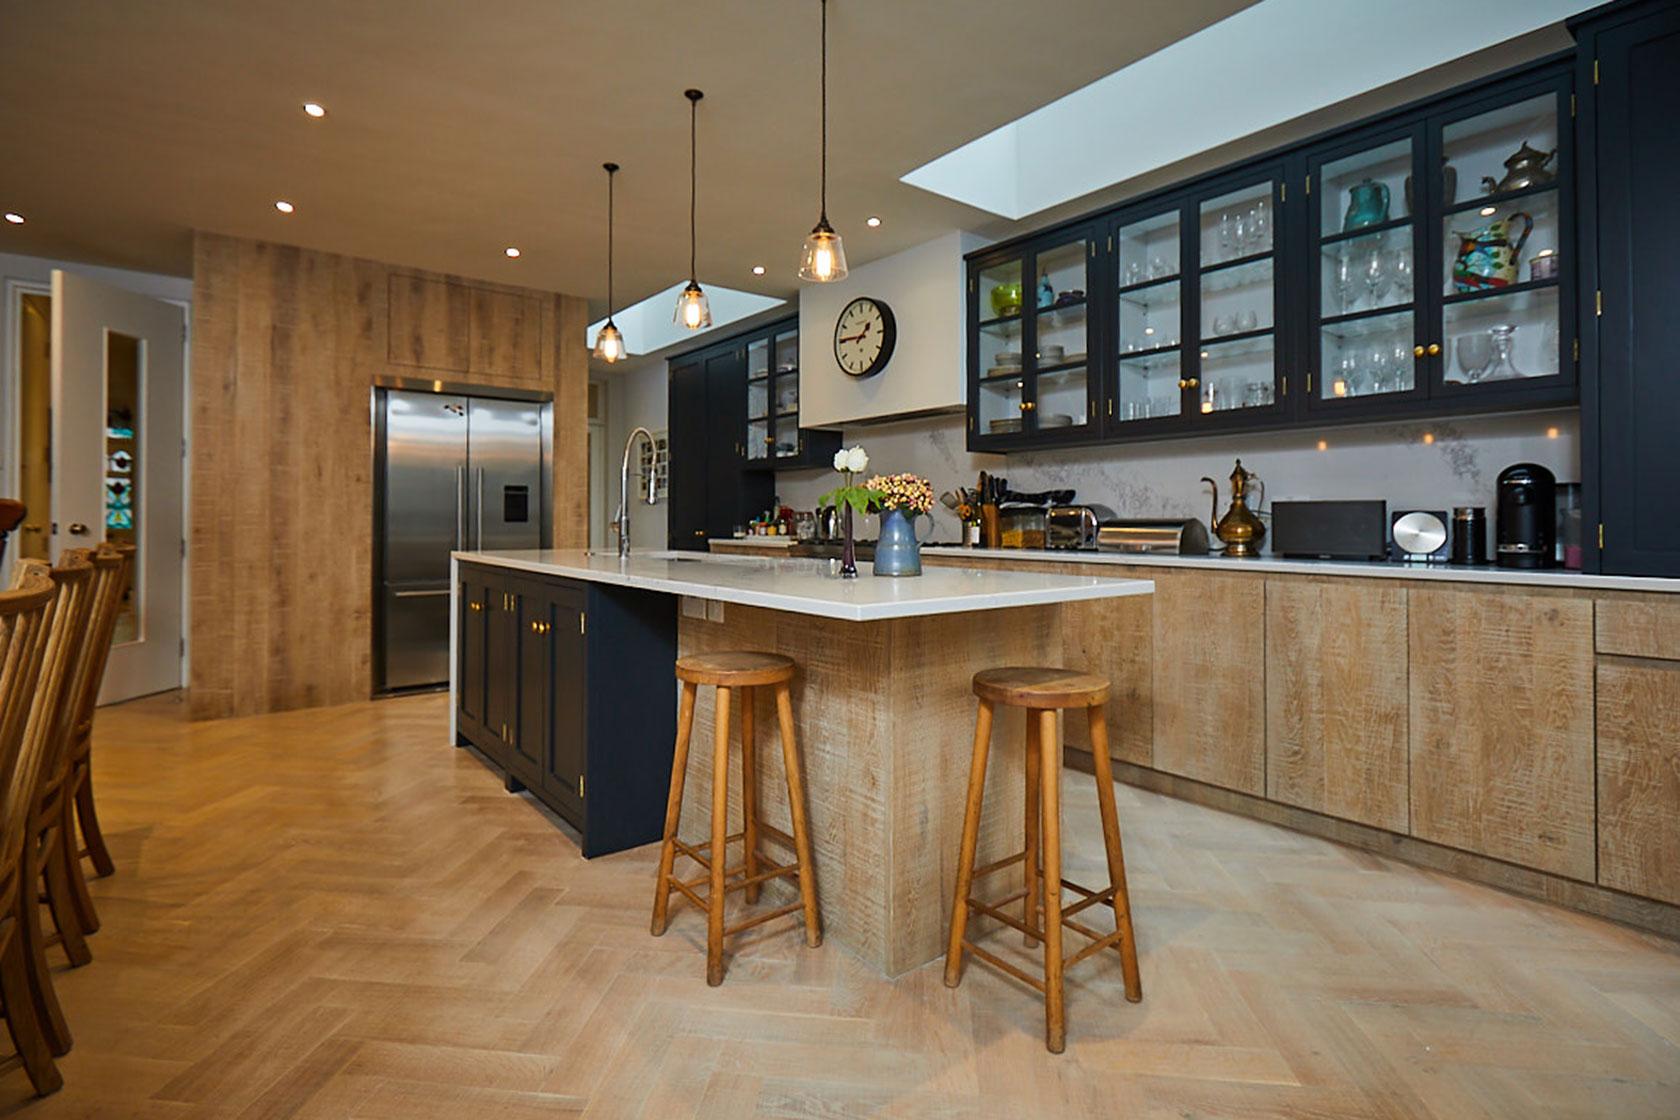 Kitchen island and bespoke range run with parquet wood floor boards